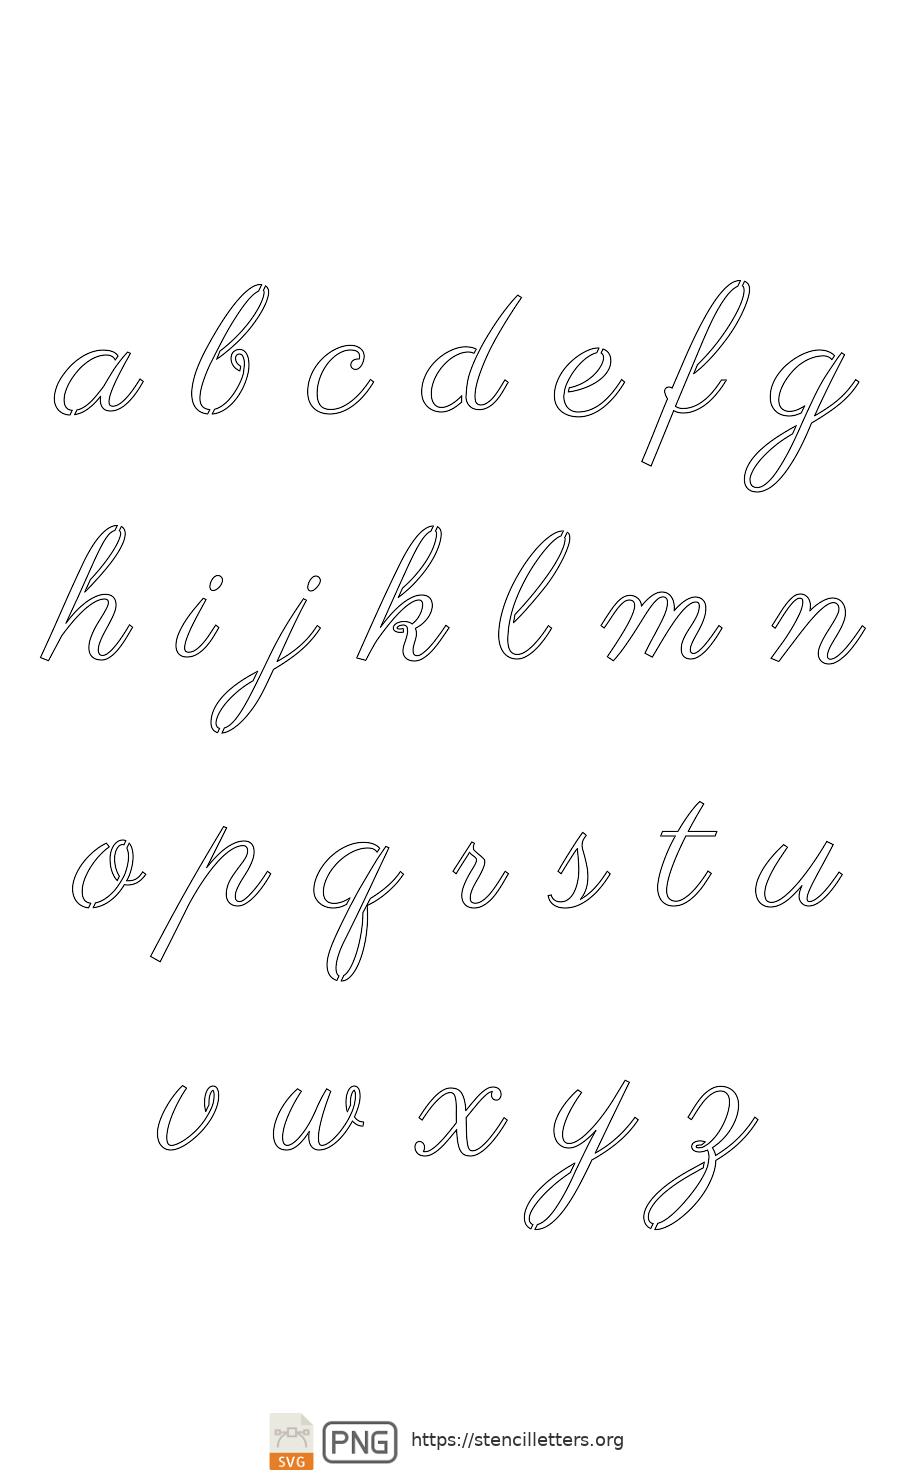 60's Retro Calligraphy lowercase letter stencils